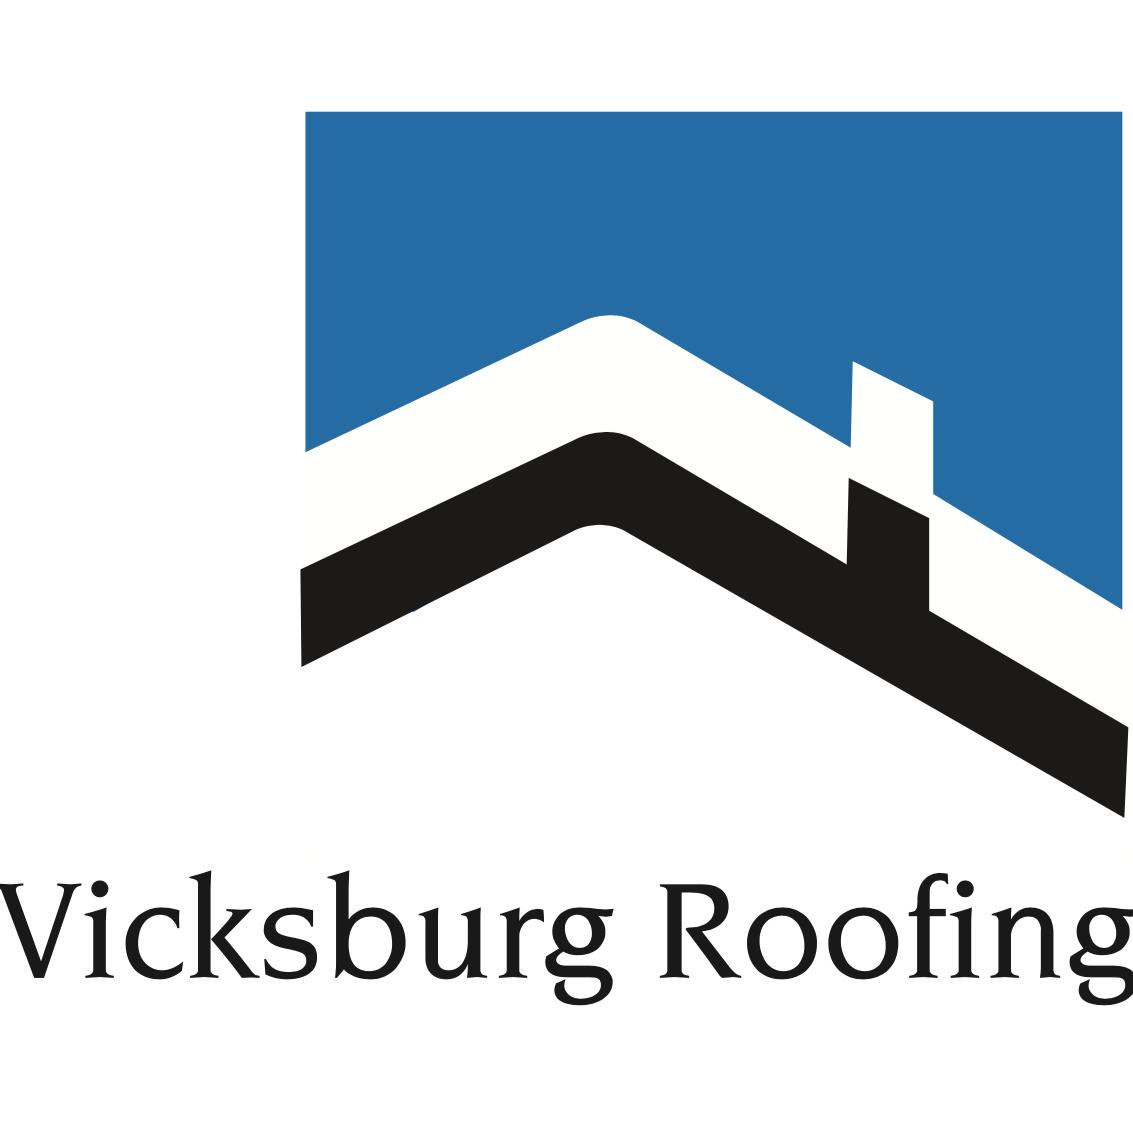 Vicksburg Roofing Inc. image 3